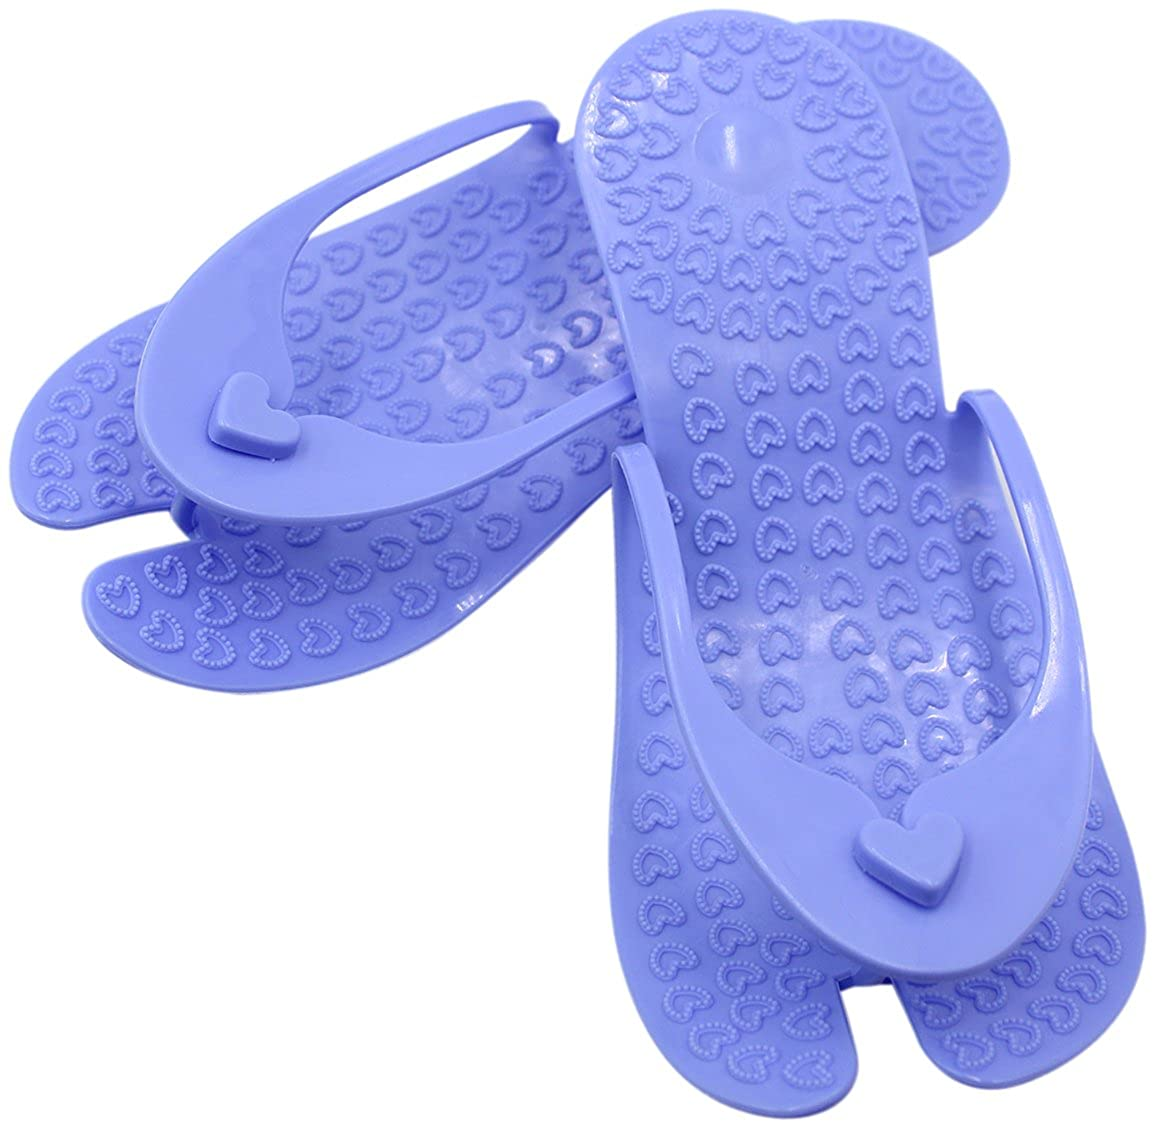 59d365a7f3ff1f Amazon.com  CC-US Portable   Foldable Foot Massage Slippers Non-Slip Flip- Flops Bathroom Shower Sandals for Travel Beach  Toys   Games